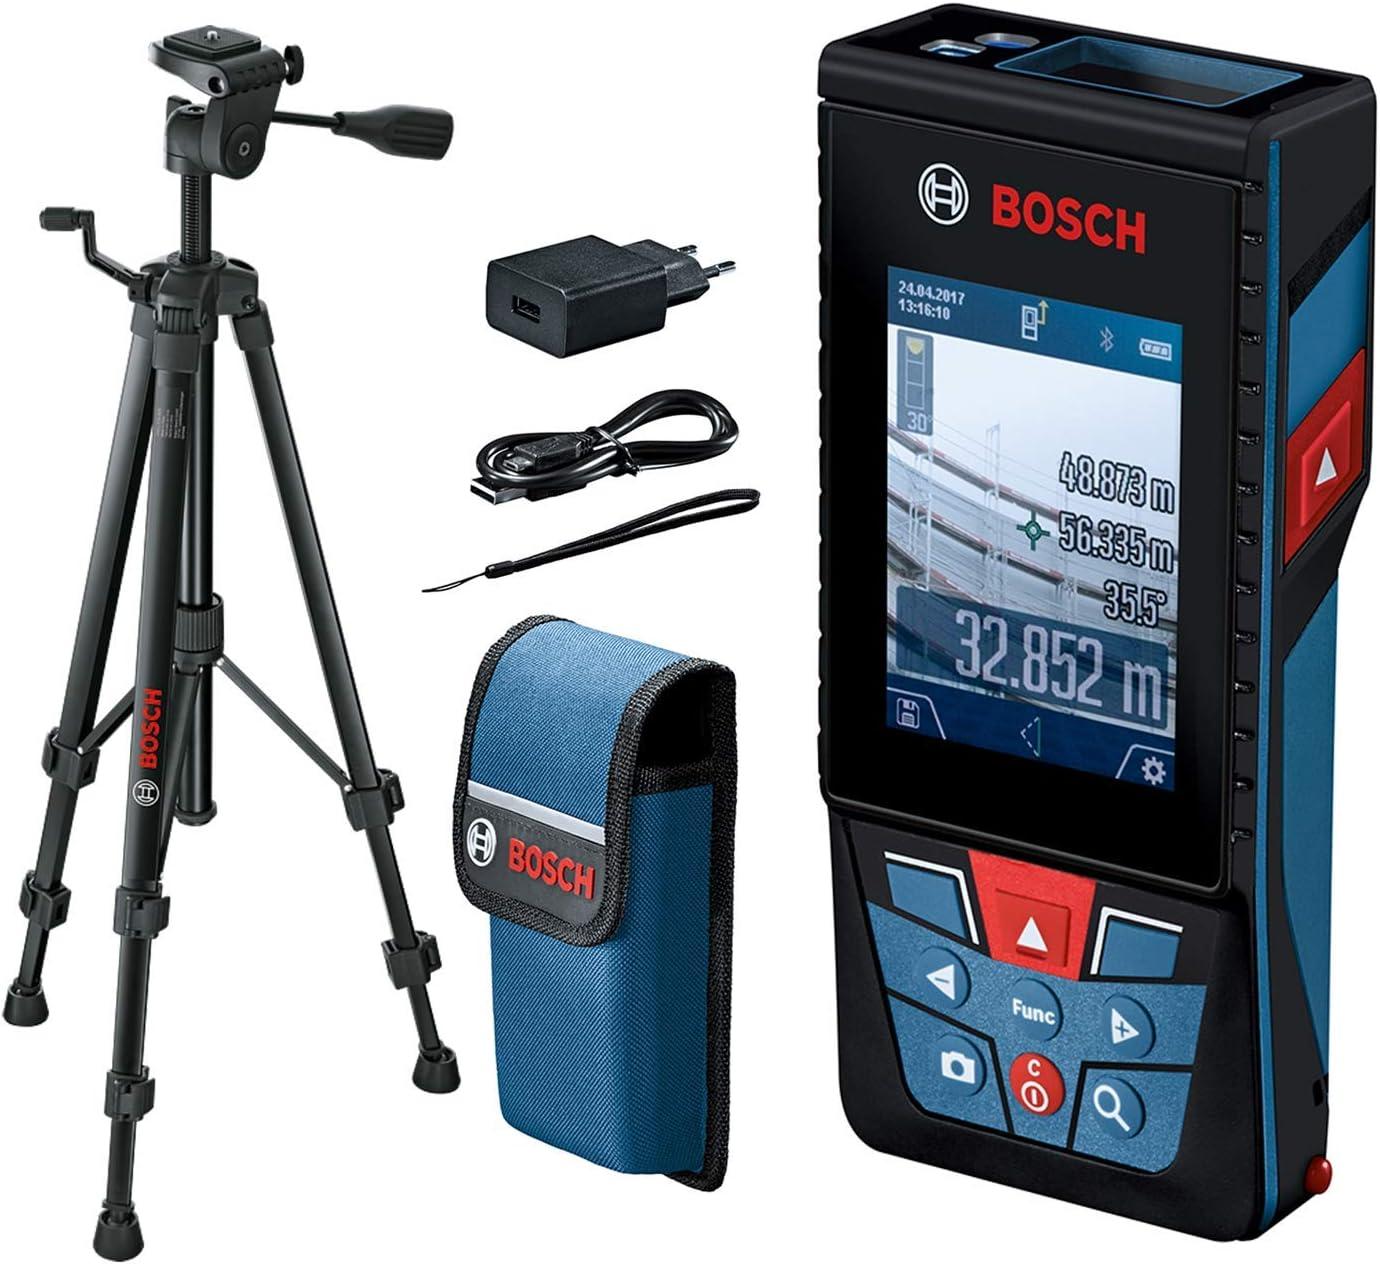 Bosch Professional Medidor láser de distancia GLM 120 C (cámara integrada, transmisión de datos Bluetooth, máxima distancia: 120 m, cable micro USB, correa de transporte, funda, trípode BT 150)